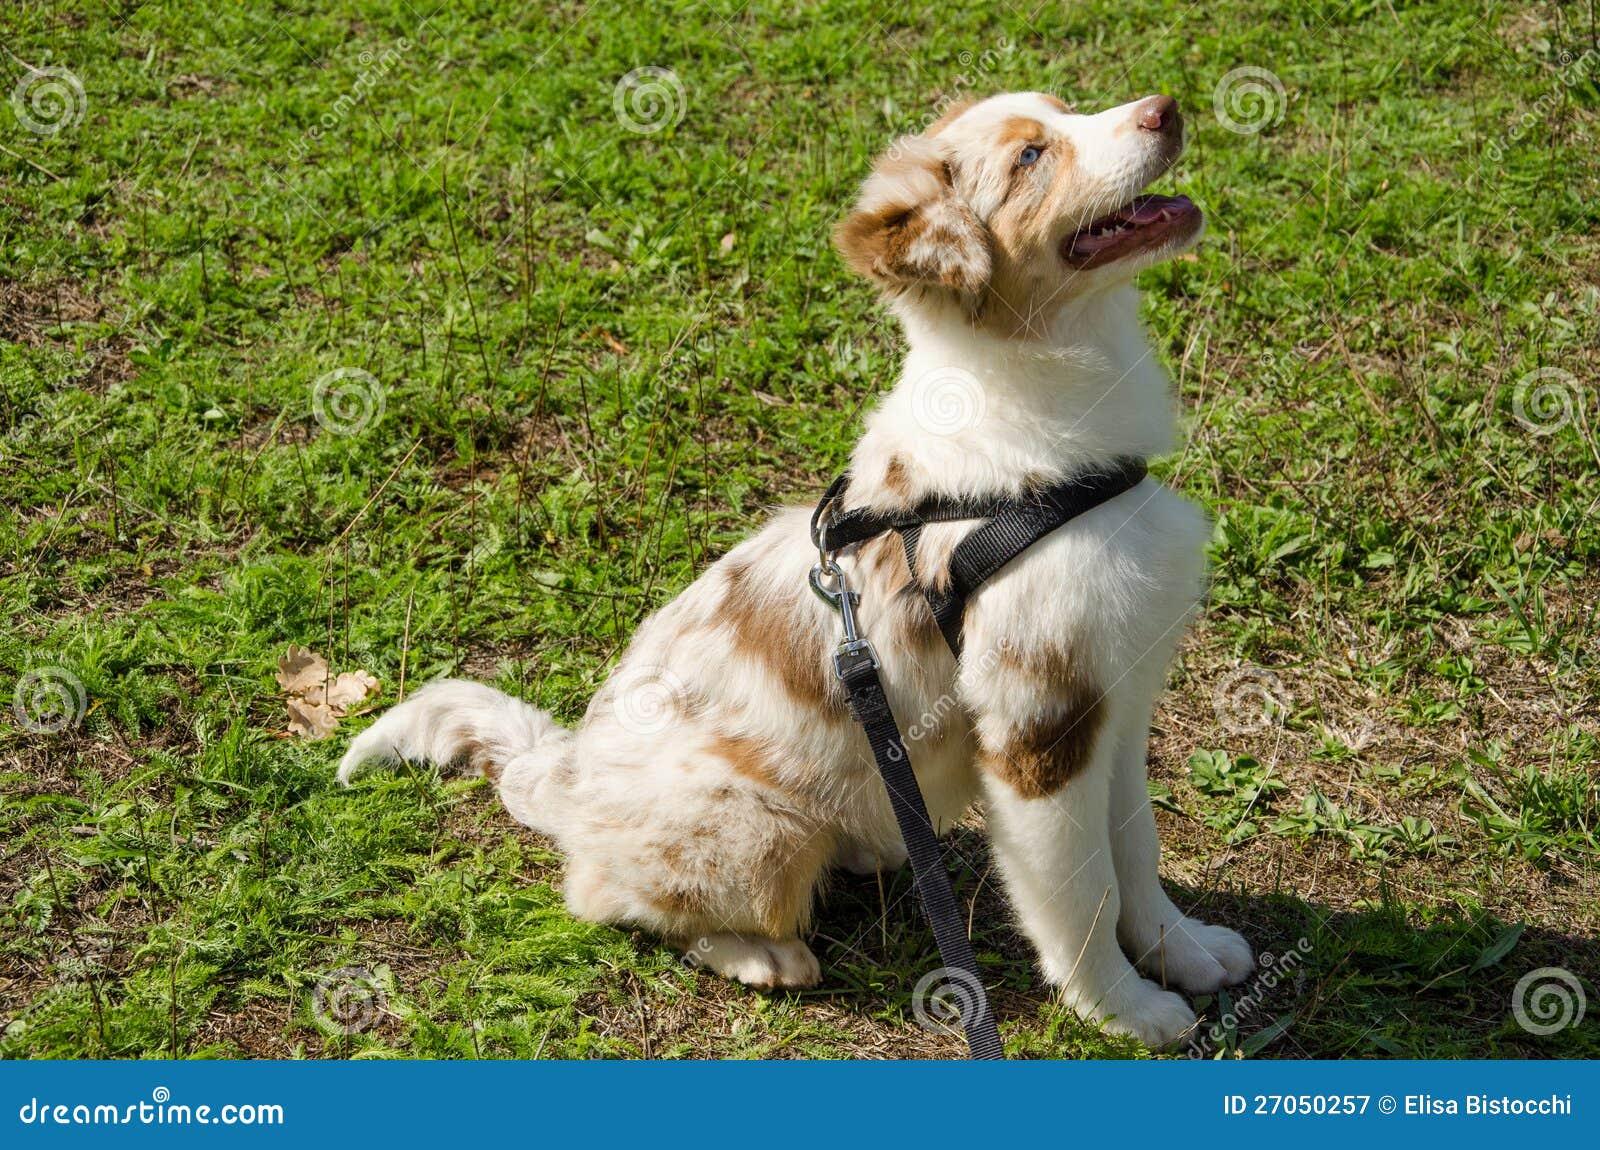 Puppy Of Red Merle Australian Shepherd Royalty Free Stock ...